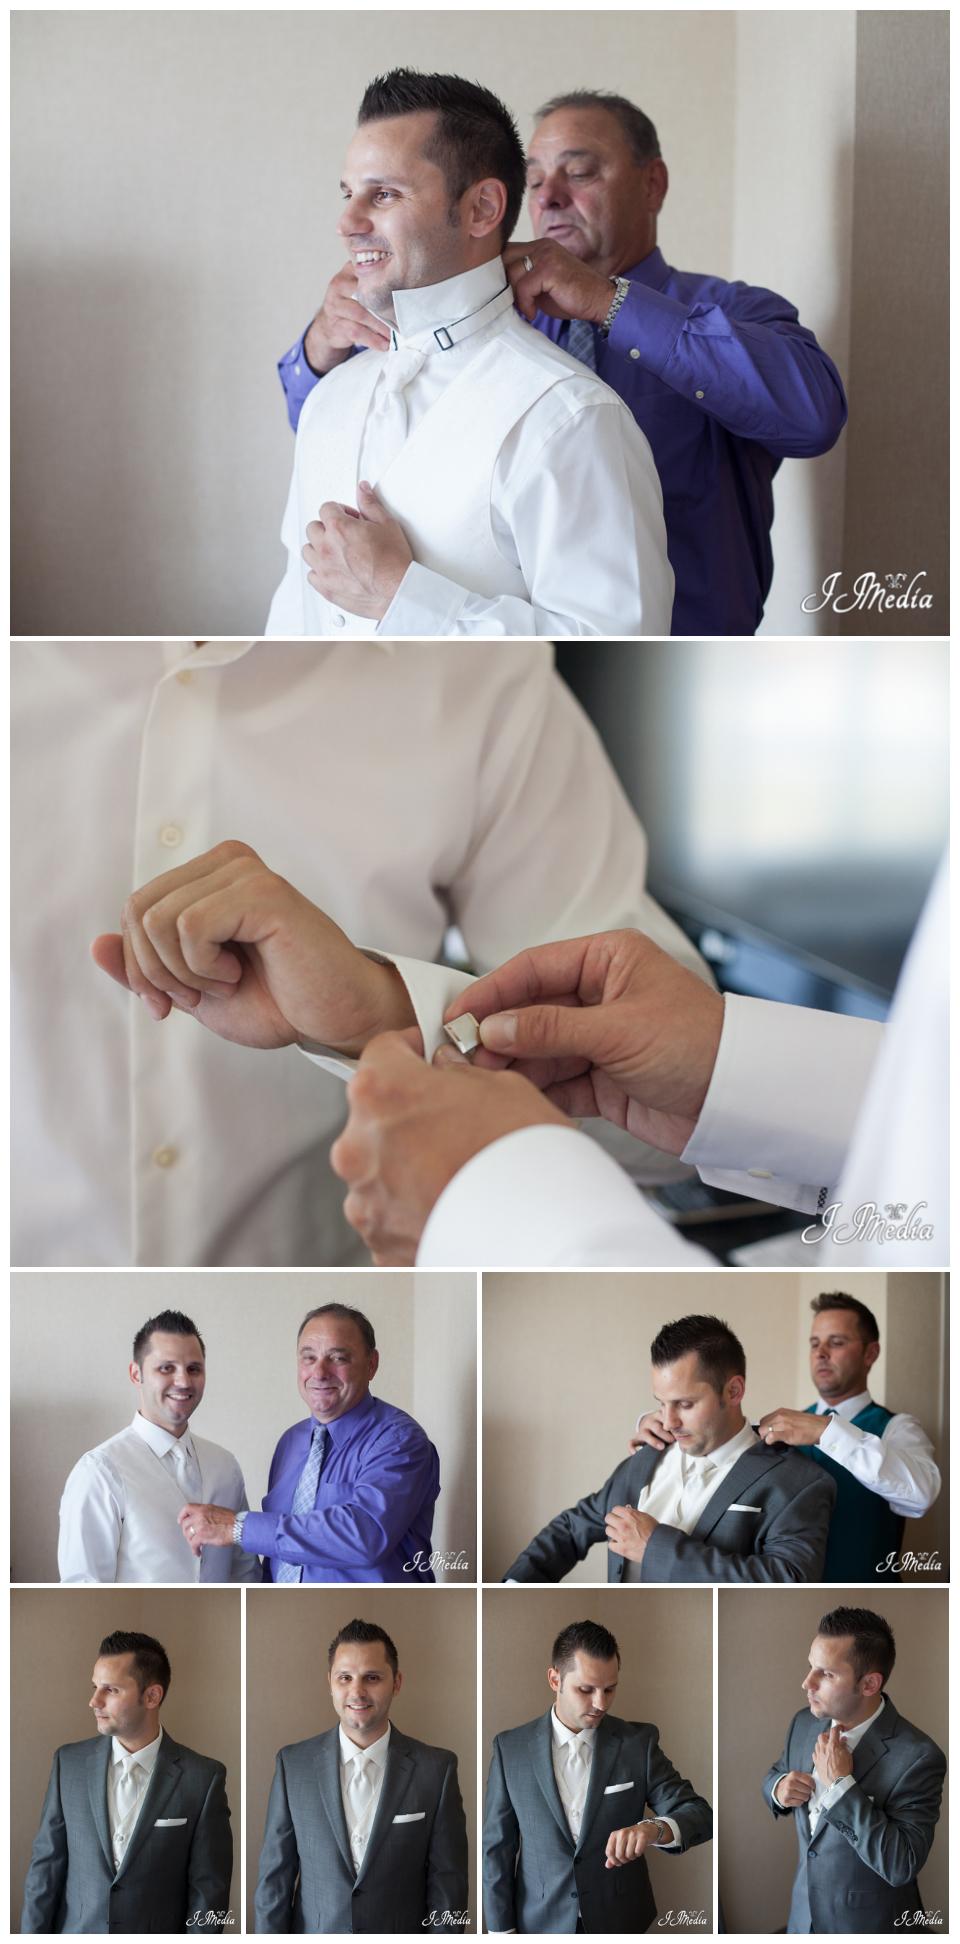 Atrium-Wedding-Photography-JJMedia-1